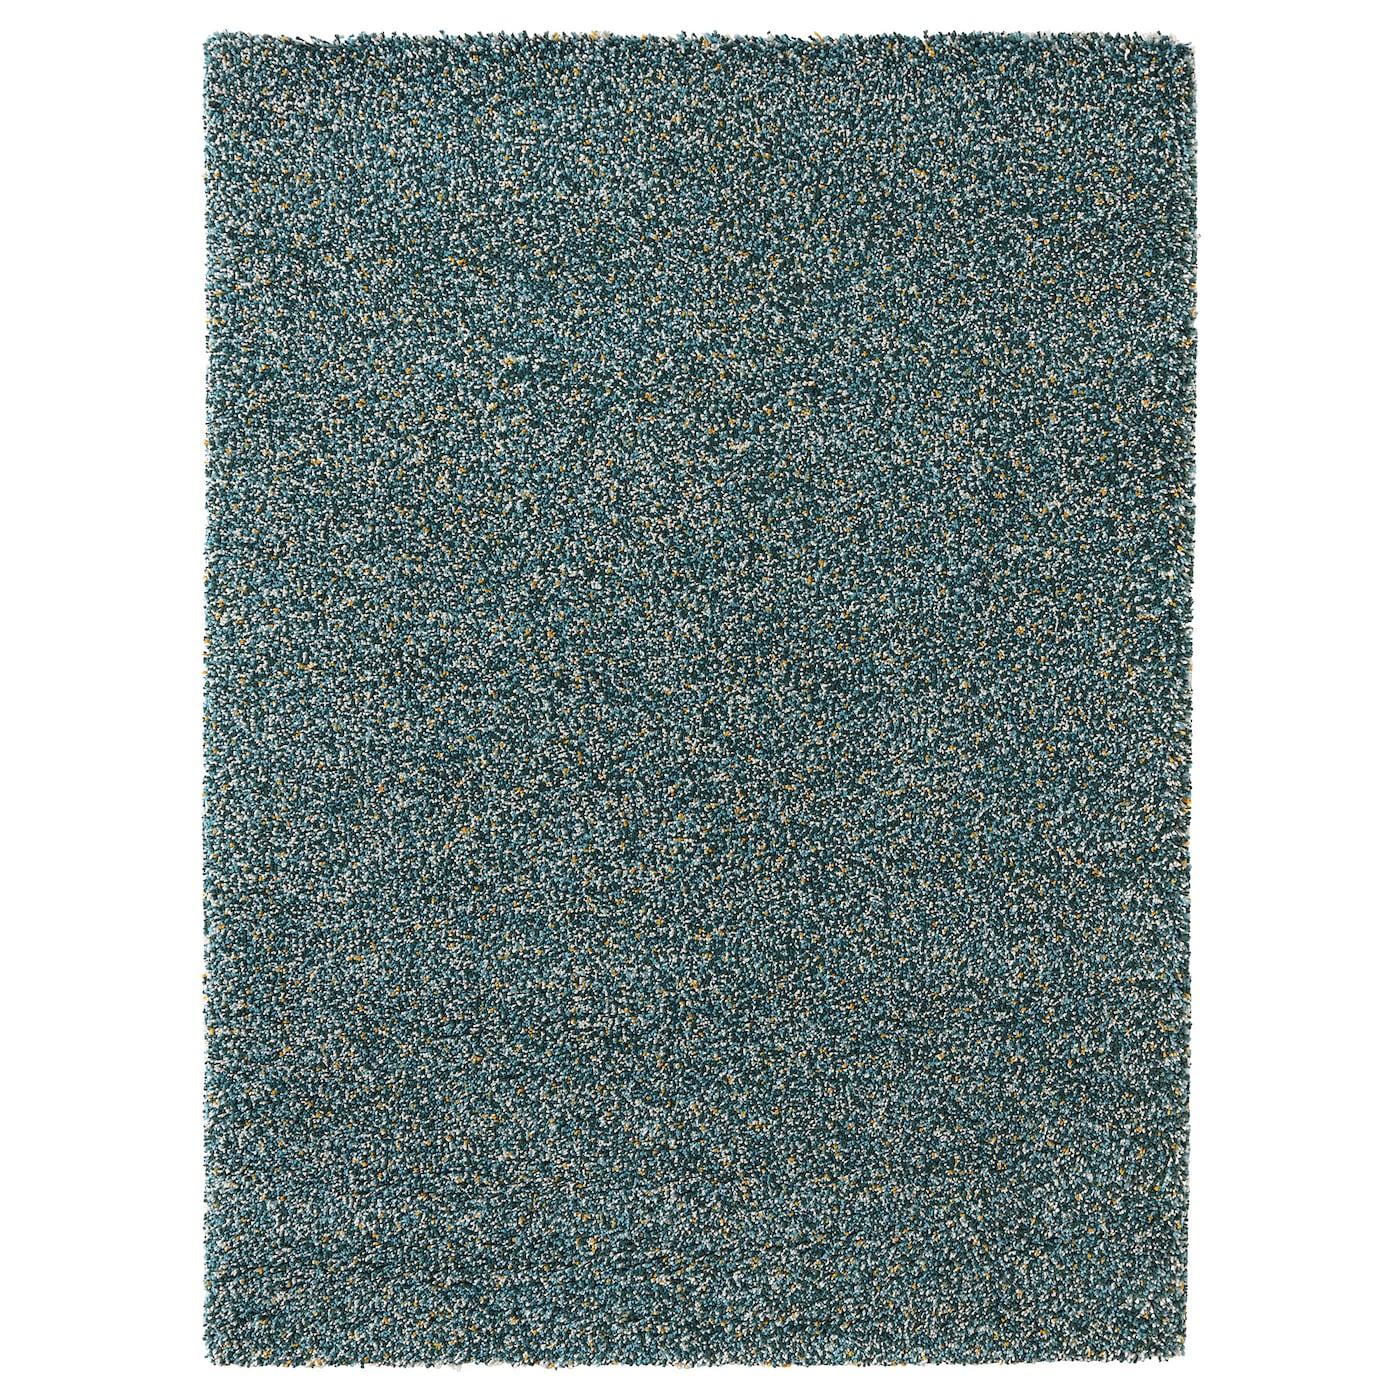 Vindum alfombra pelo largo verde azulado 170 x 230 cm ikea - Alfombra verde ikea ...